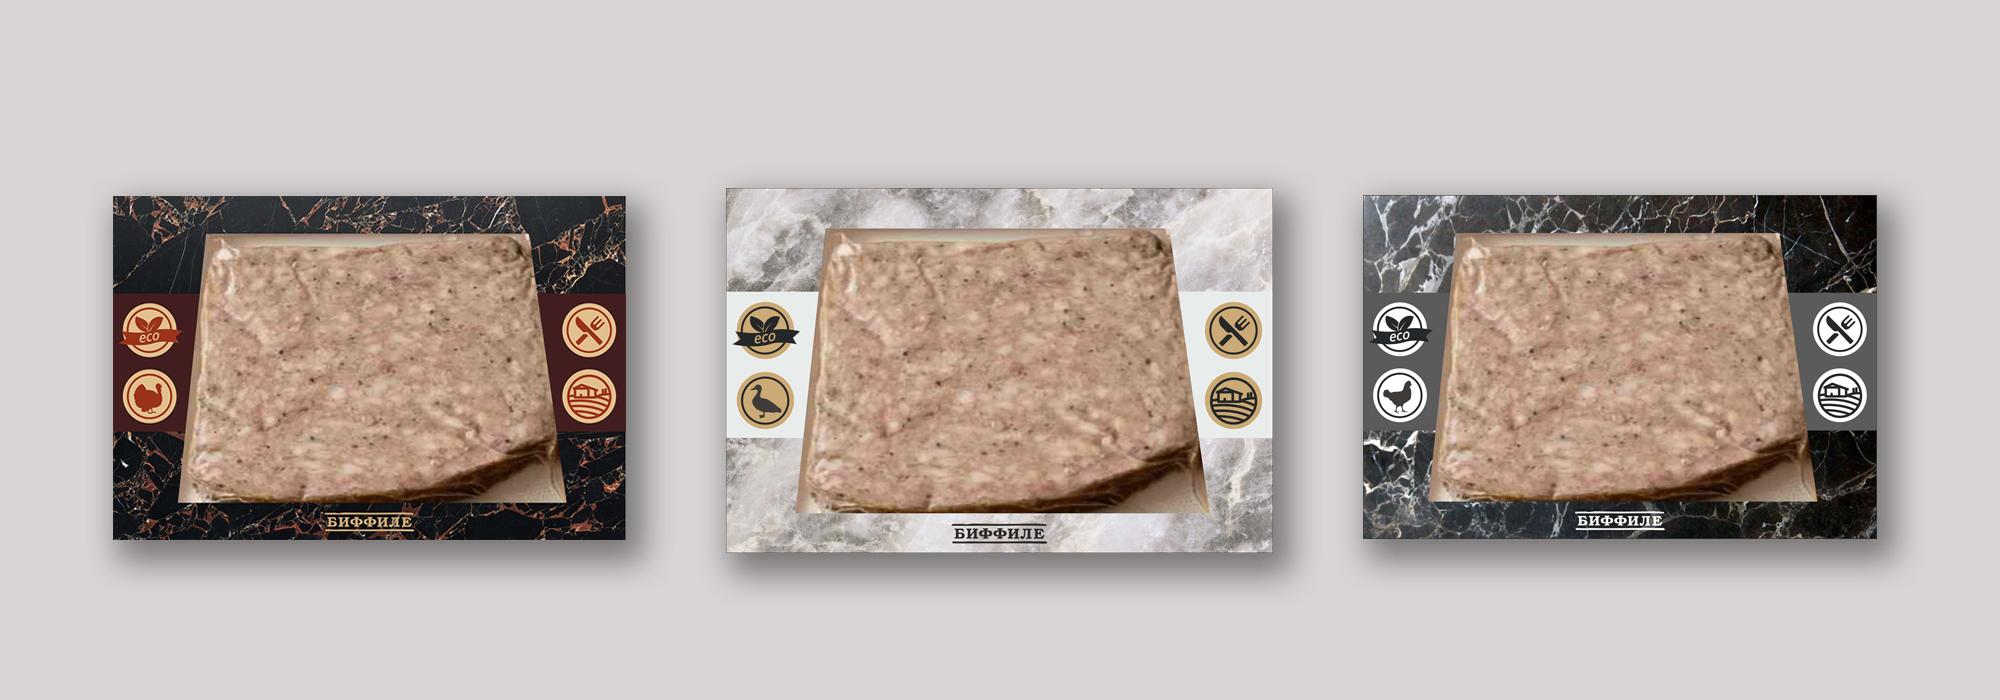 БИФФИЛЕ [премиум паштет] часть мрамор